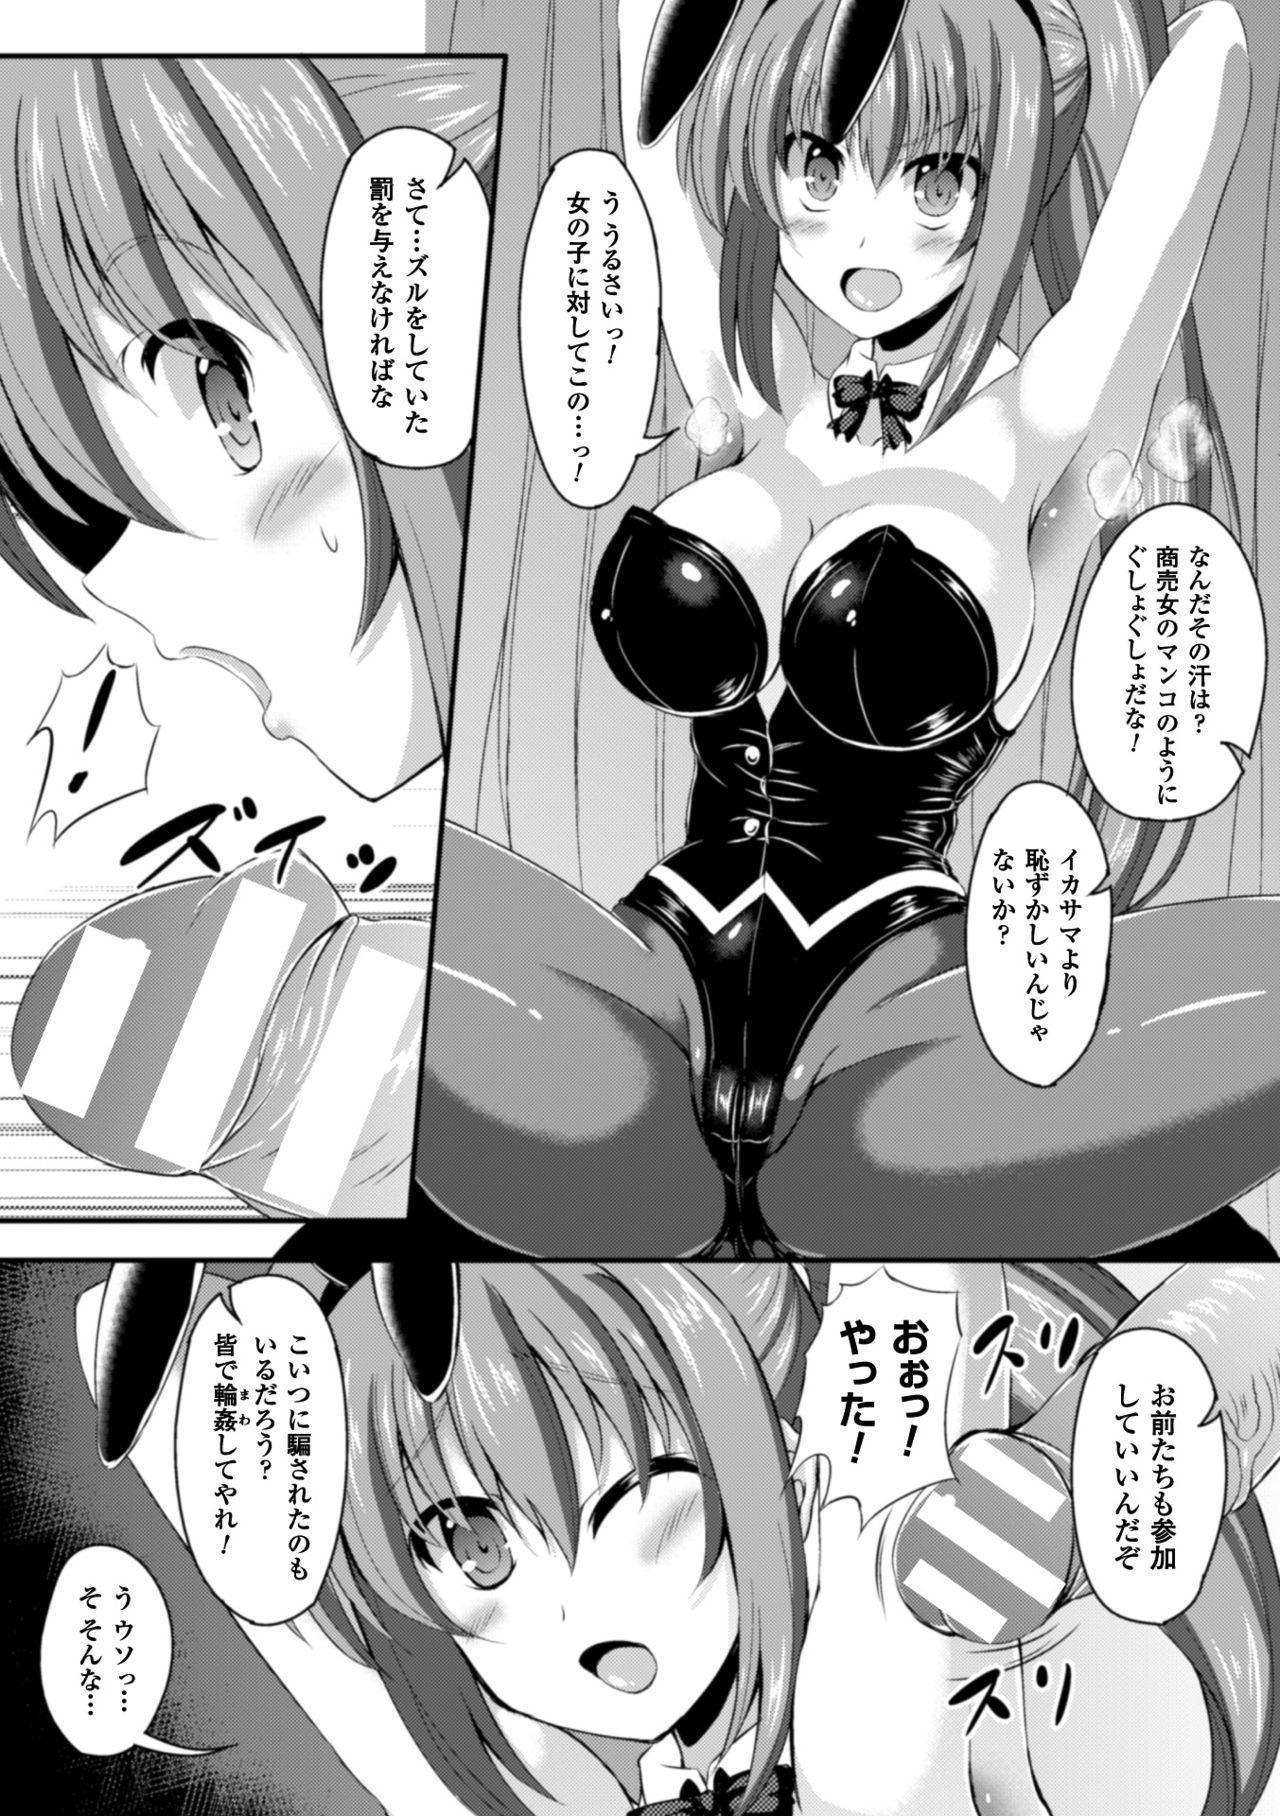 2D Comic Magazine Waki Feti Bunny Girl Vol. 1 72